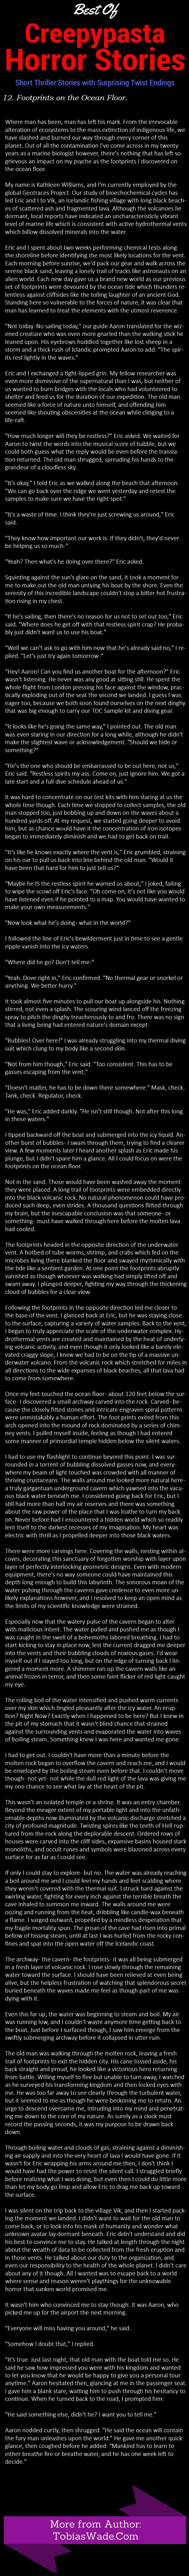 Footprints on the Ocean Floor Scary creepypasta horror story